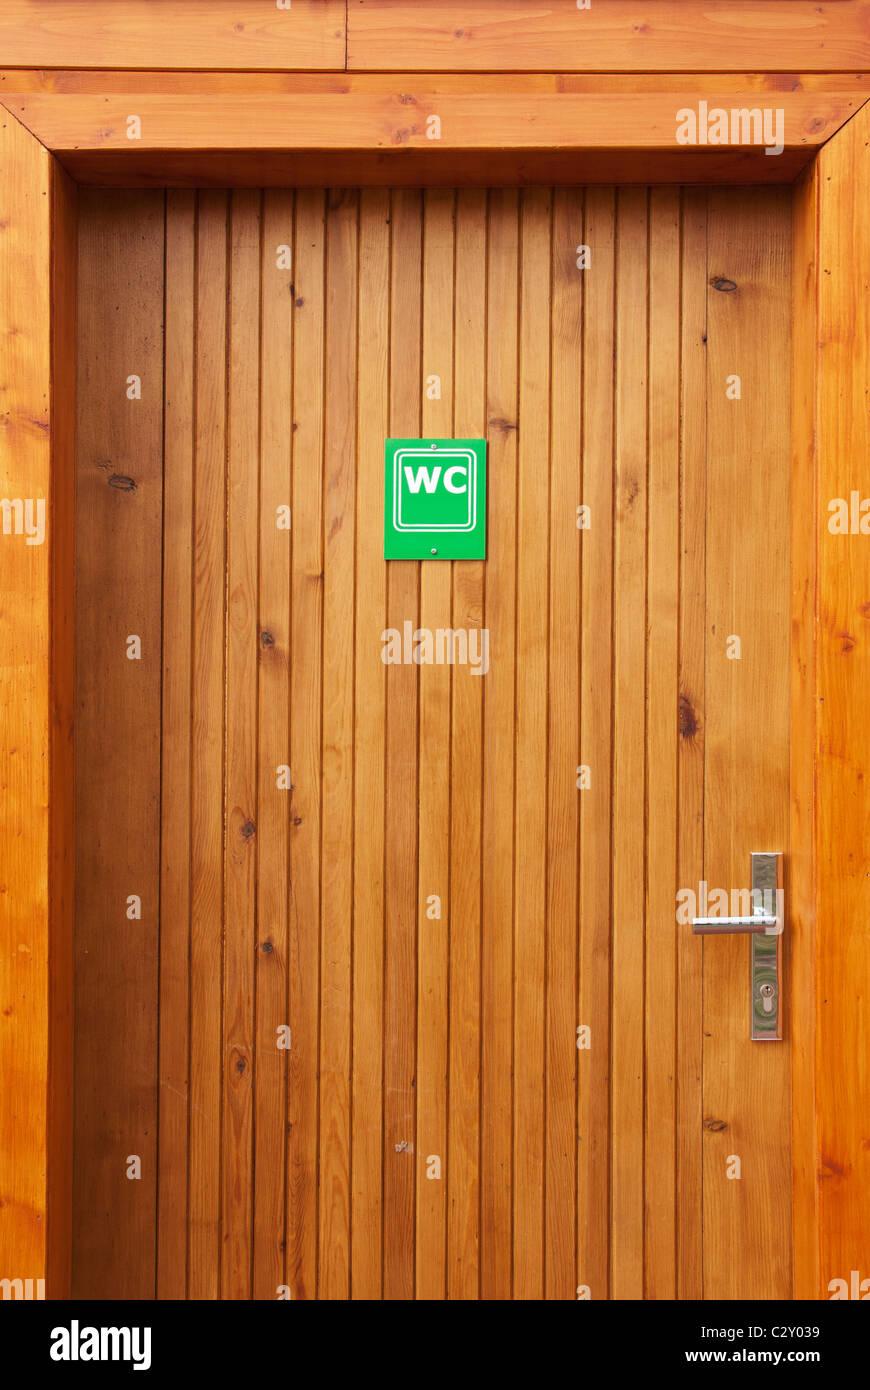 wooden door with WC sign - Stock Image